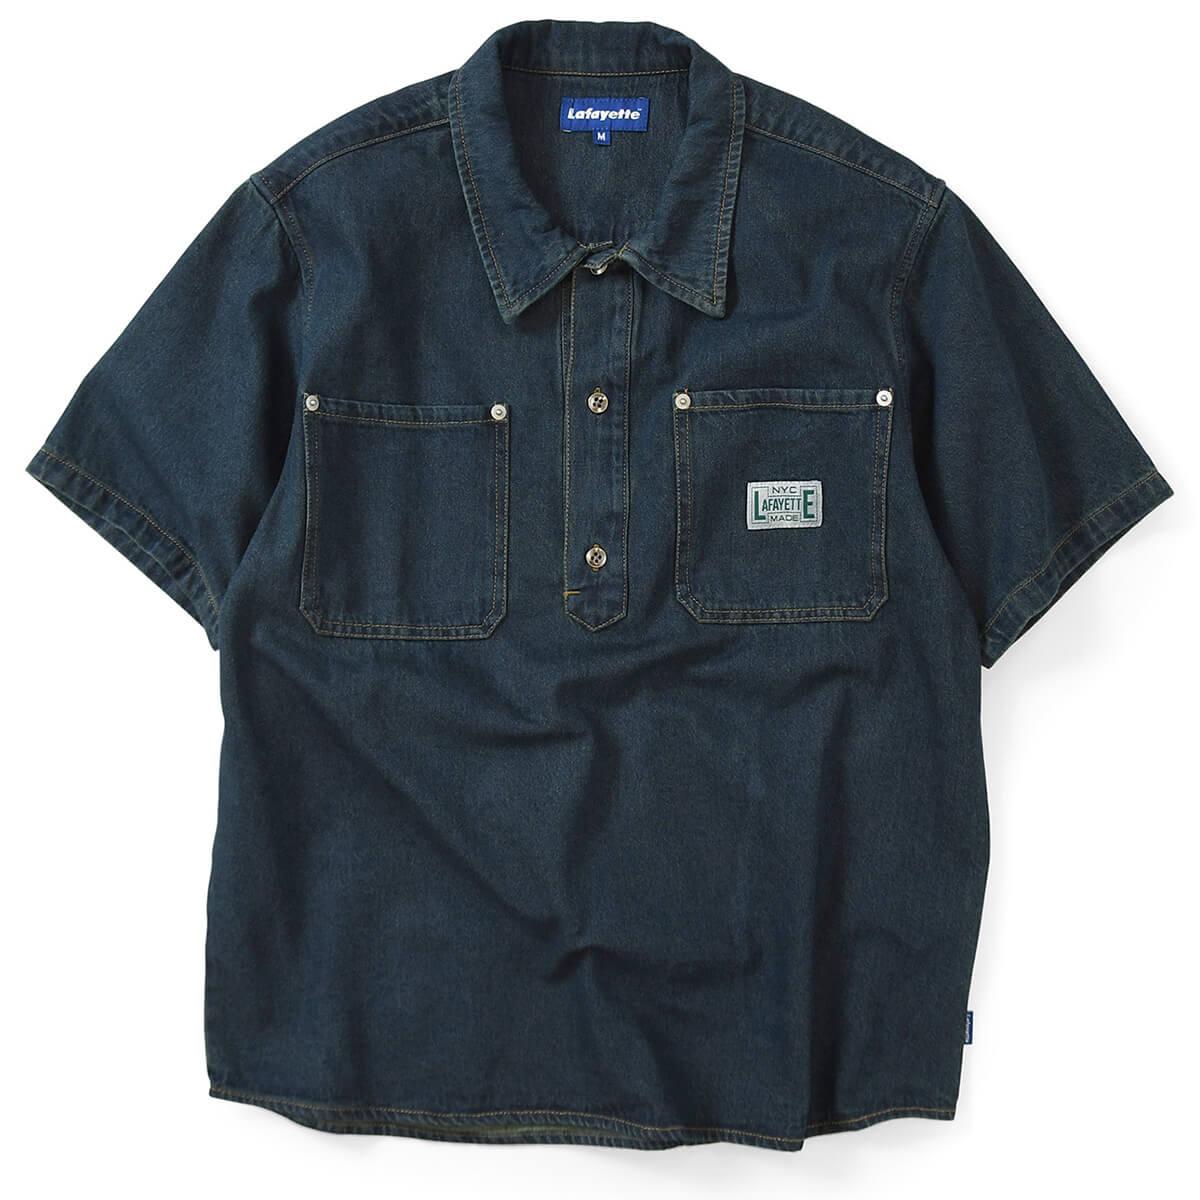 Lafayette ラファイエット 半袖 シャツ メンズ ストリート ブランド デニムシャツ プルオーバーシャツ 半そで DENIM PULLOVER S/S SHIRT LS200202 INDIGO BLUE インディゴブルー